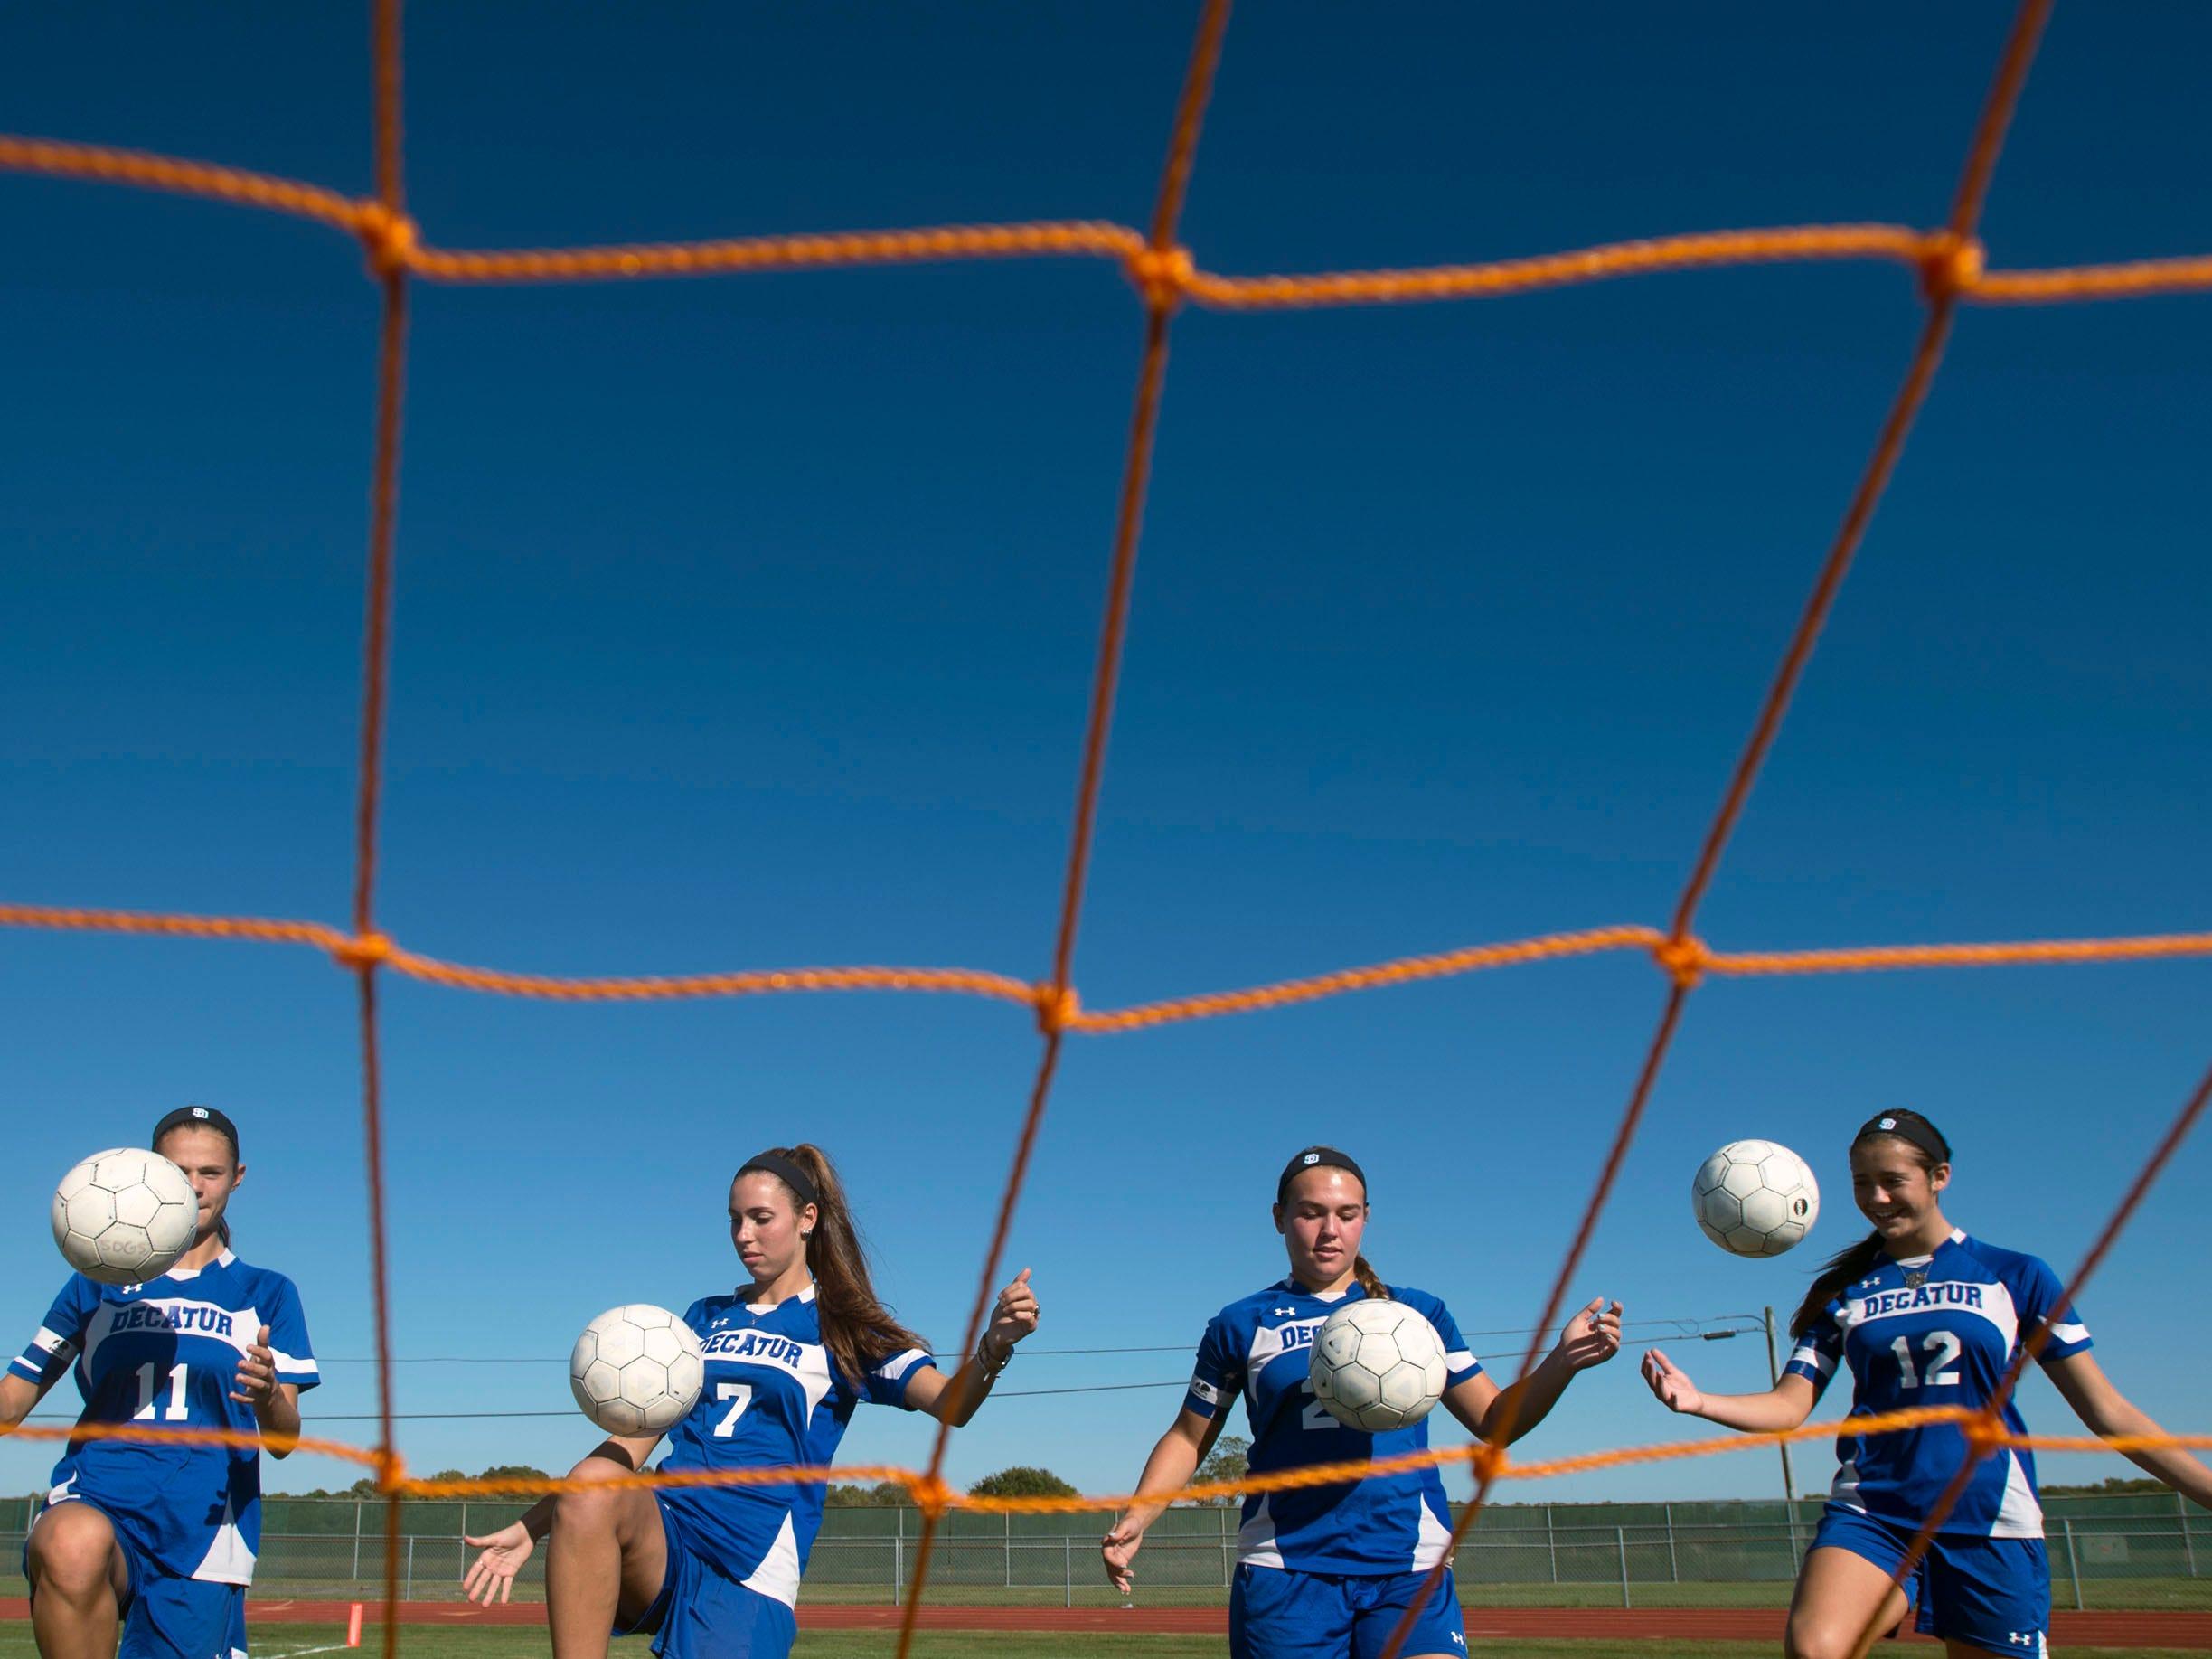 Stephen Decatur captains Ally Beck, from left, Jenna Leitgeb, Jillian Petito and Payton VanKirk.